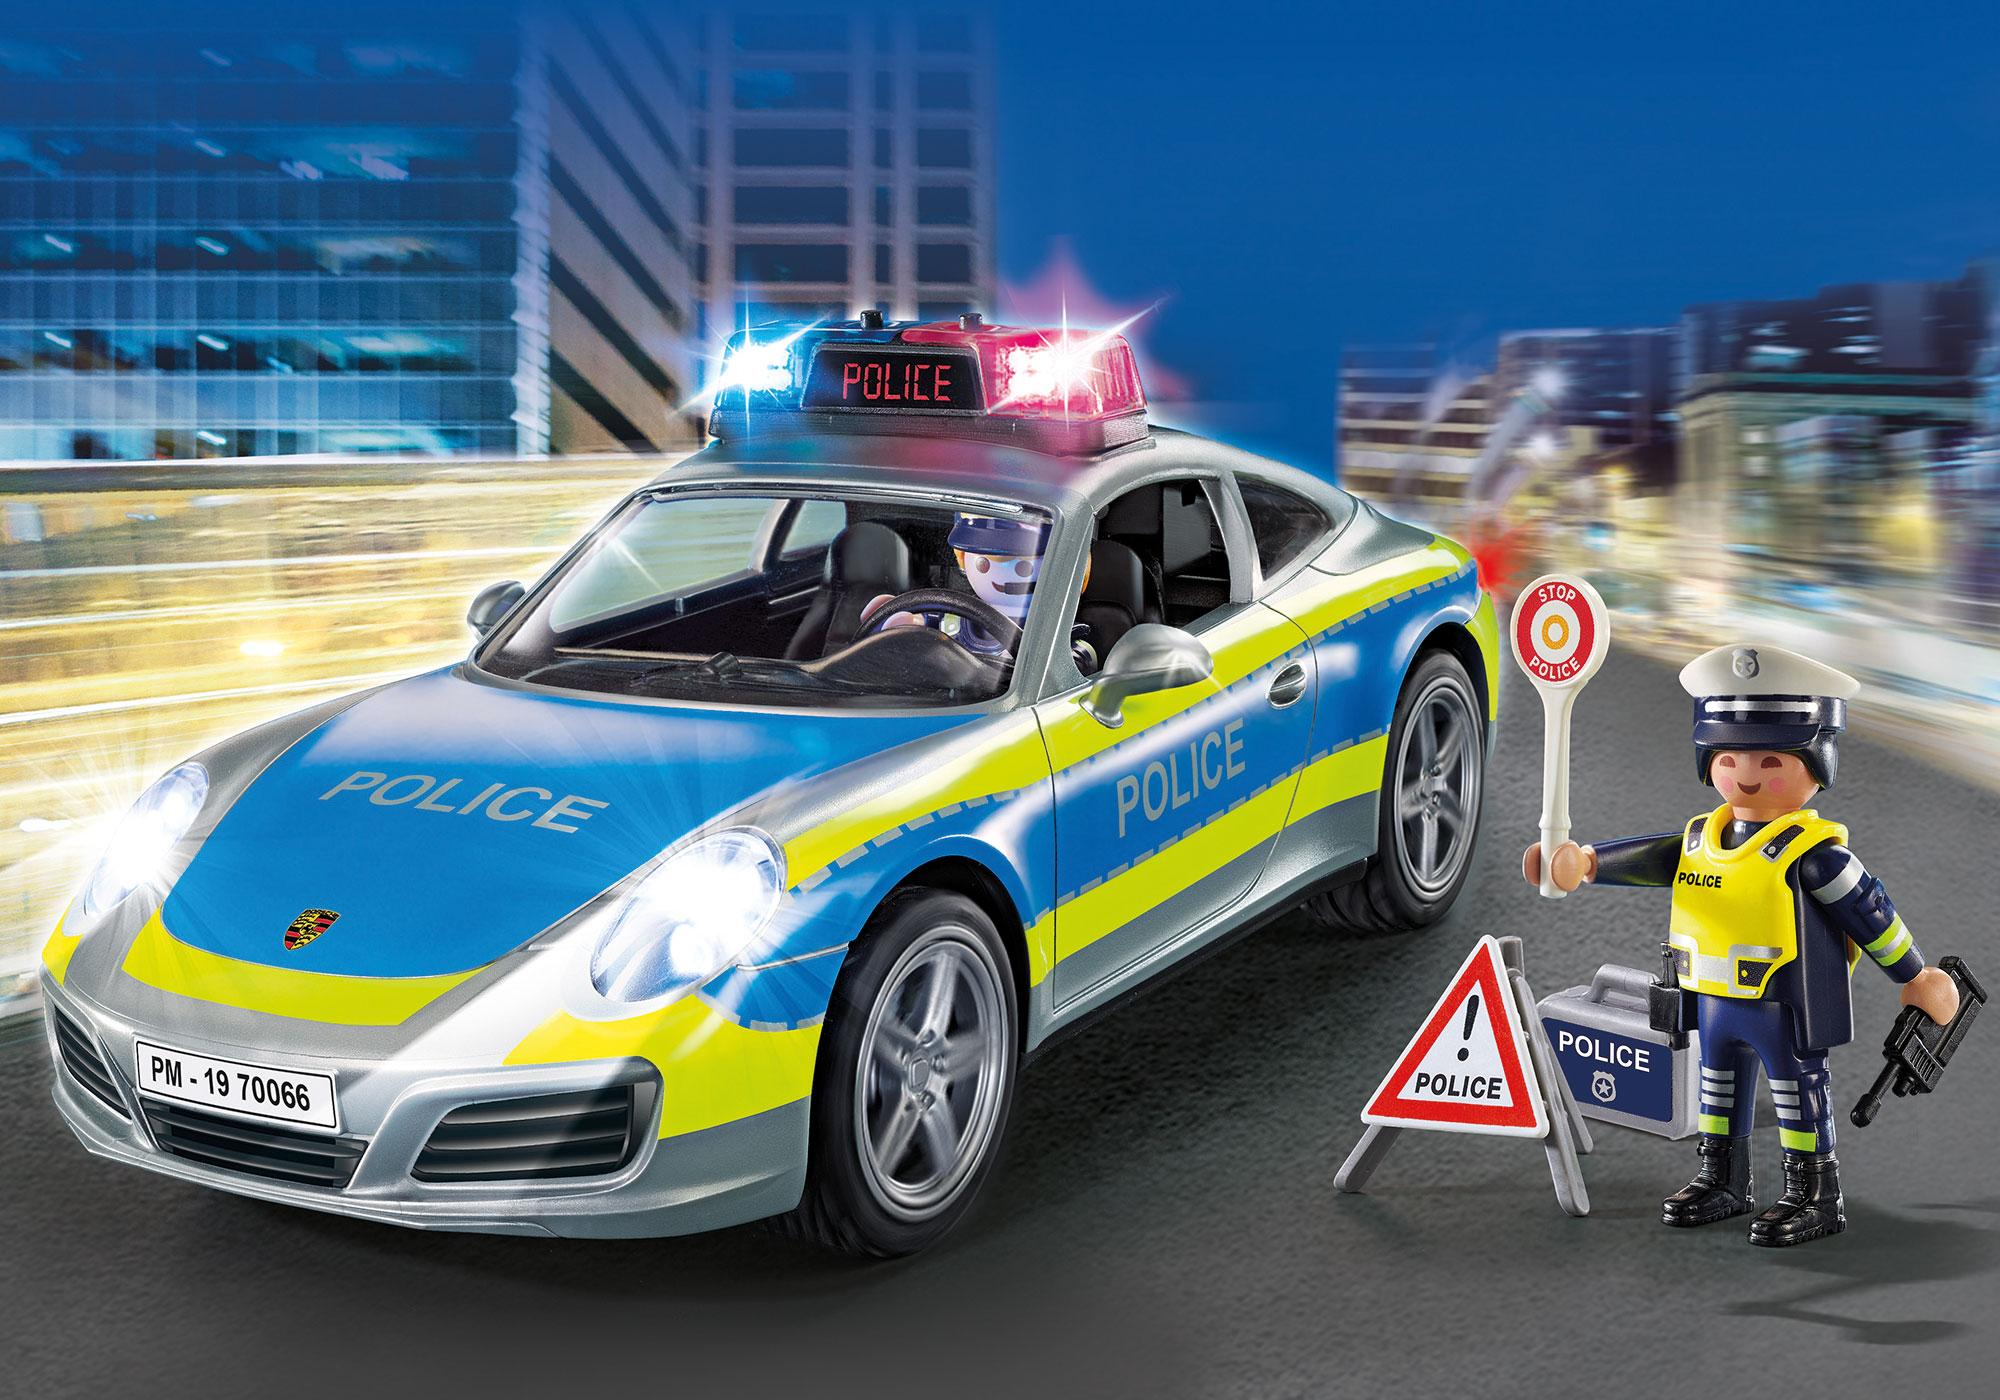 http://media.playmobil.com/i/playmobil/70066_product_detail/Porsche 911 Carrera 4S Politi